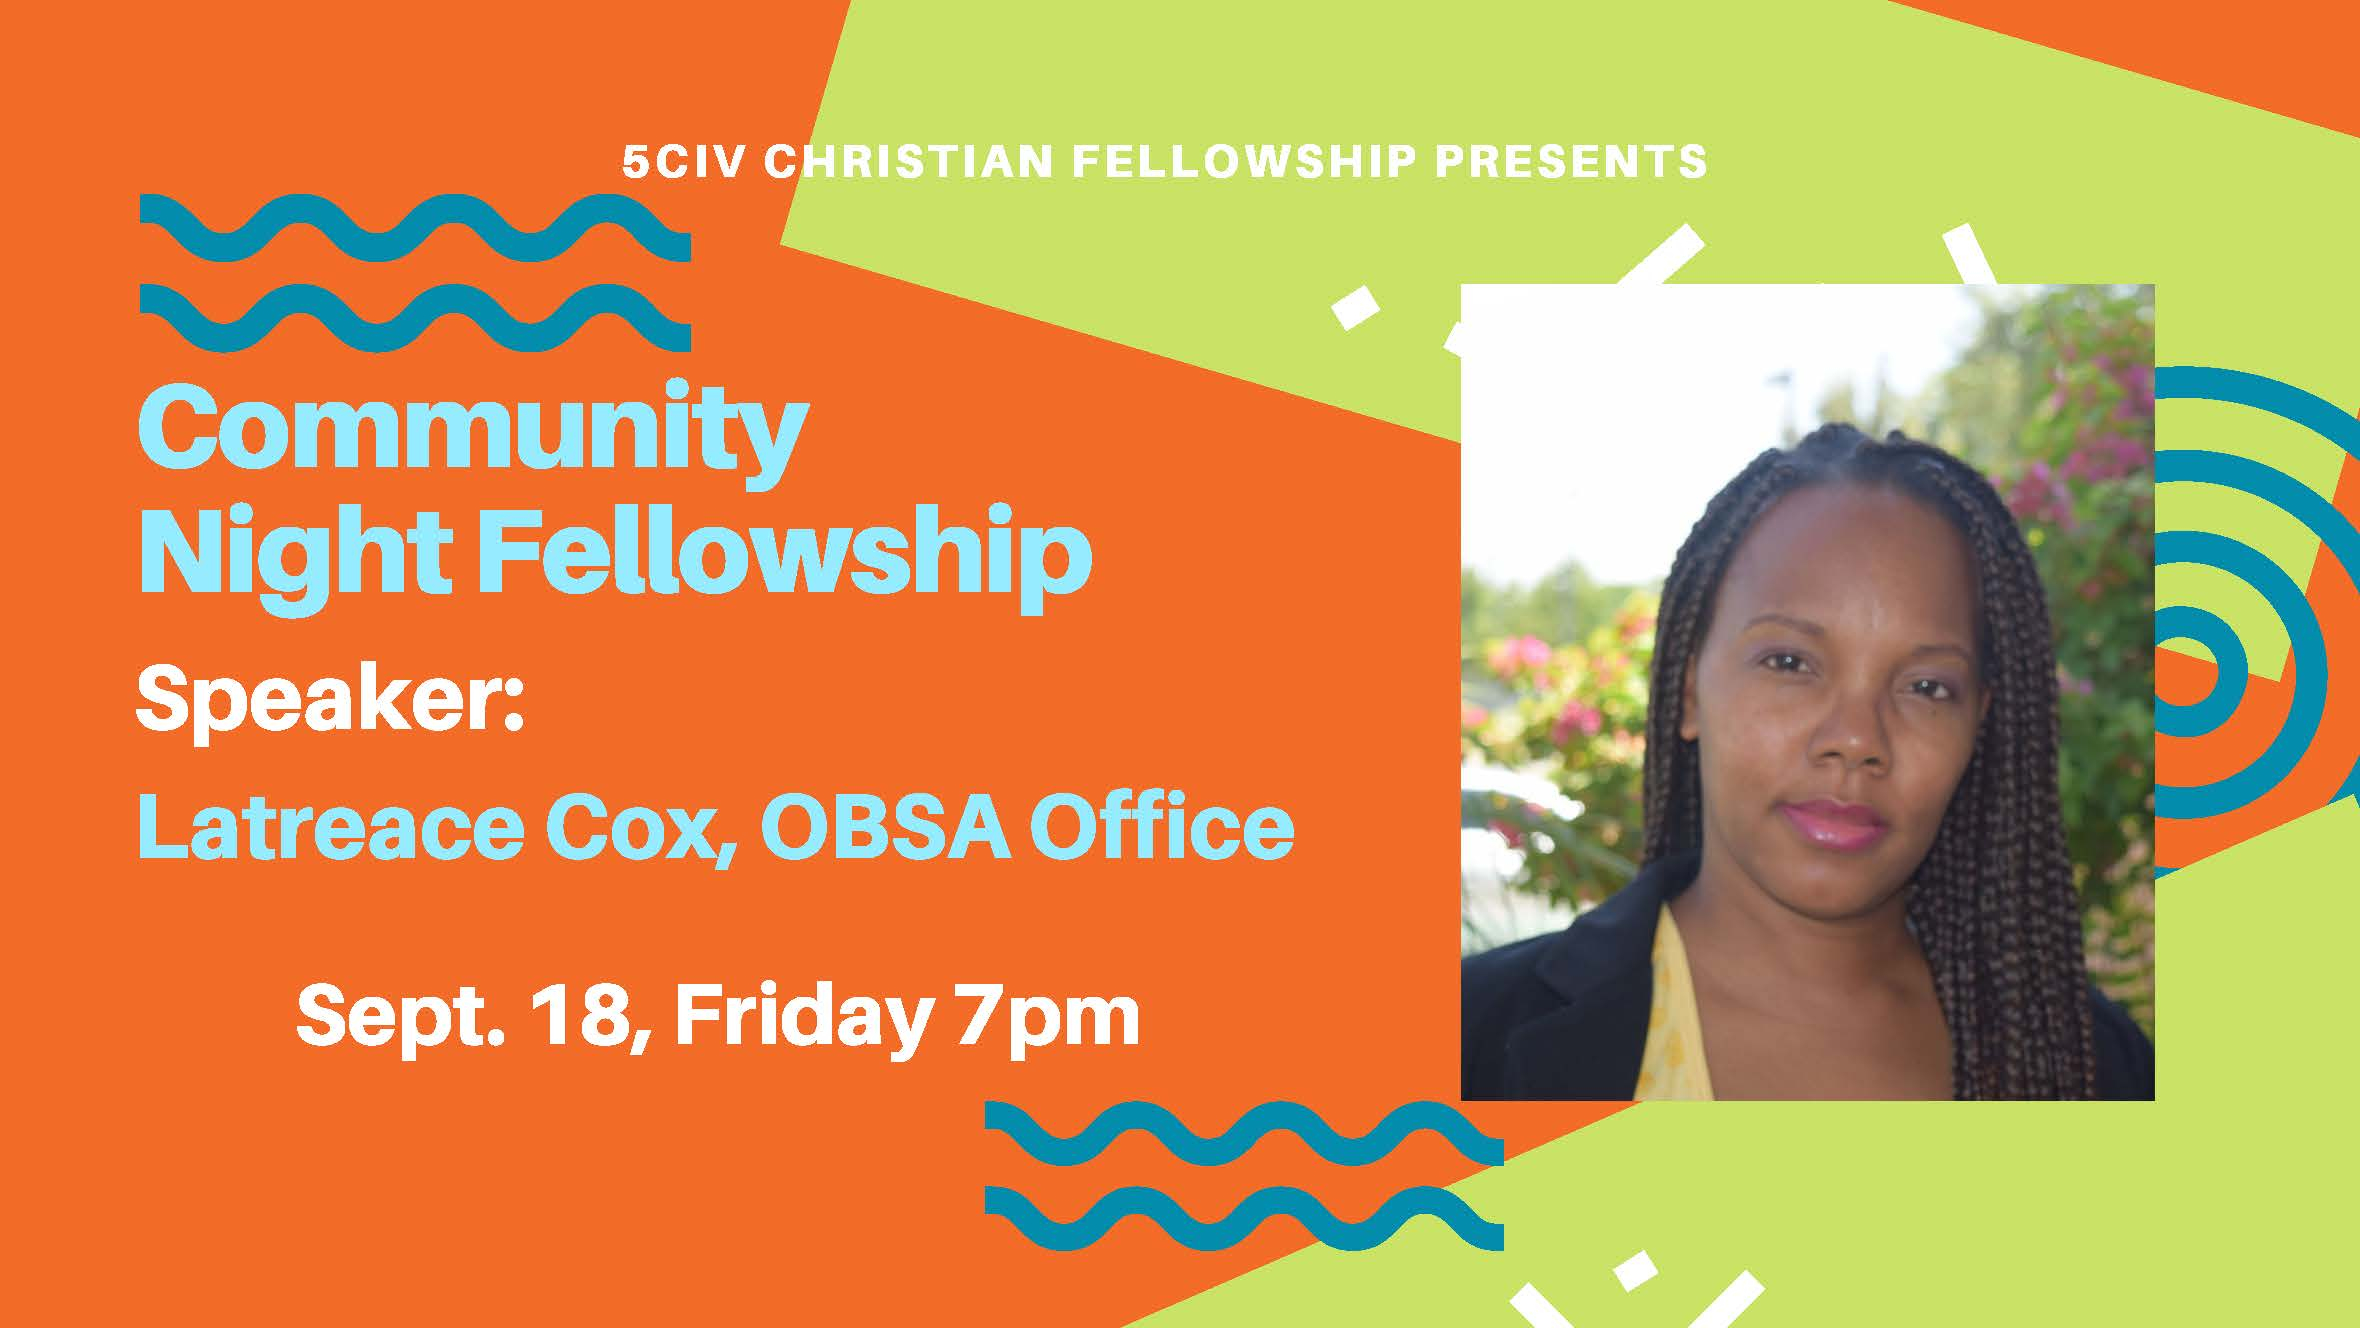 Community Night Fellowship Flyer highlighting speaker Latreace Cox of OBSA.